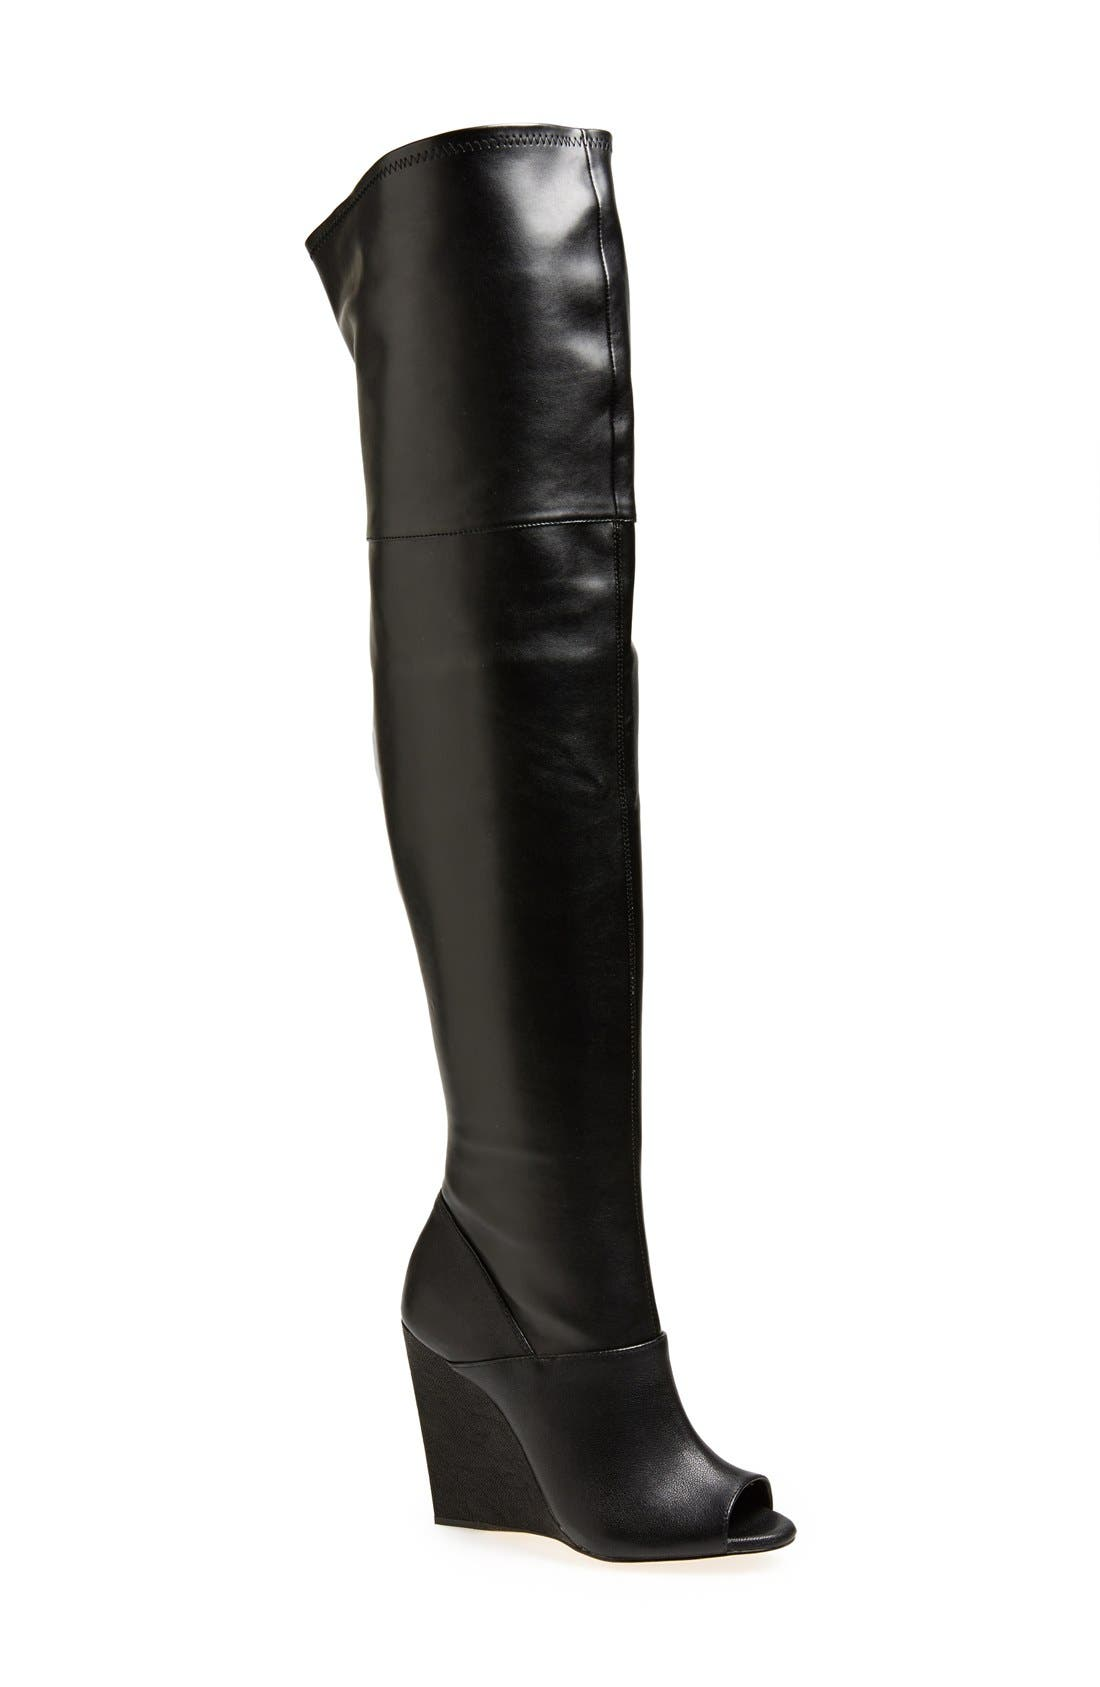 Alternate Image 1 Selected - BCBGMAXAZRIA 'Deanna' Over the Knee Leather Peep Toe Boot (Women)